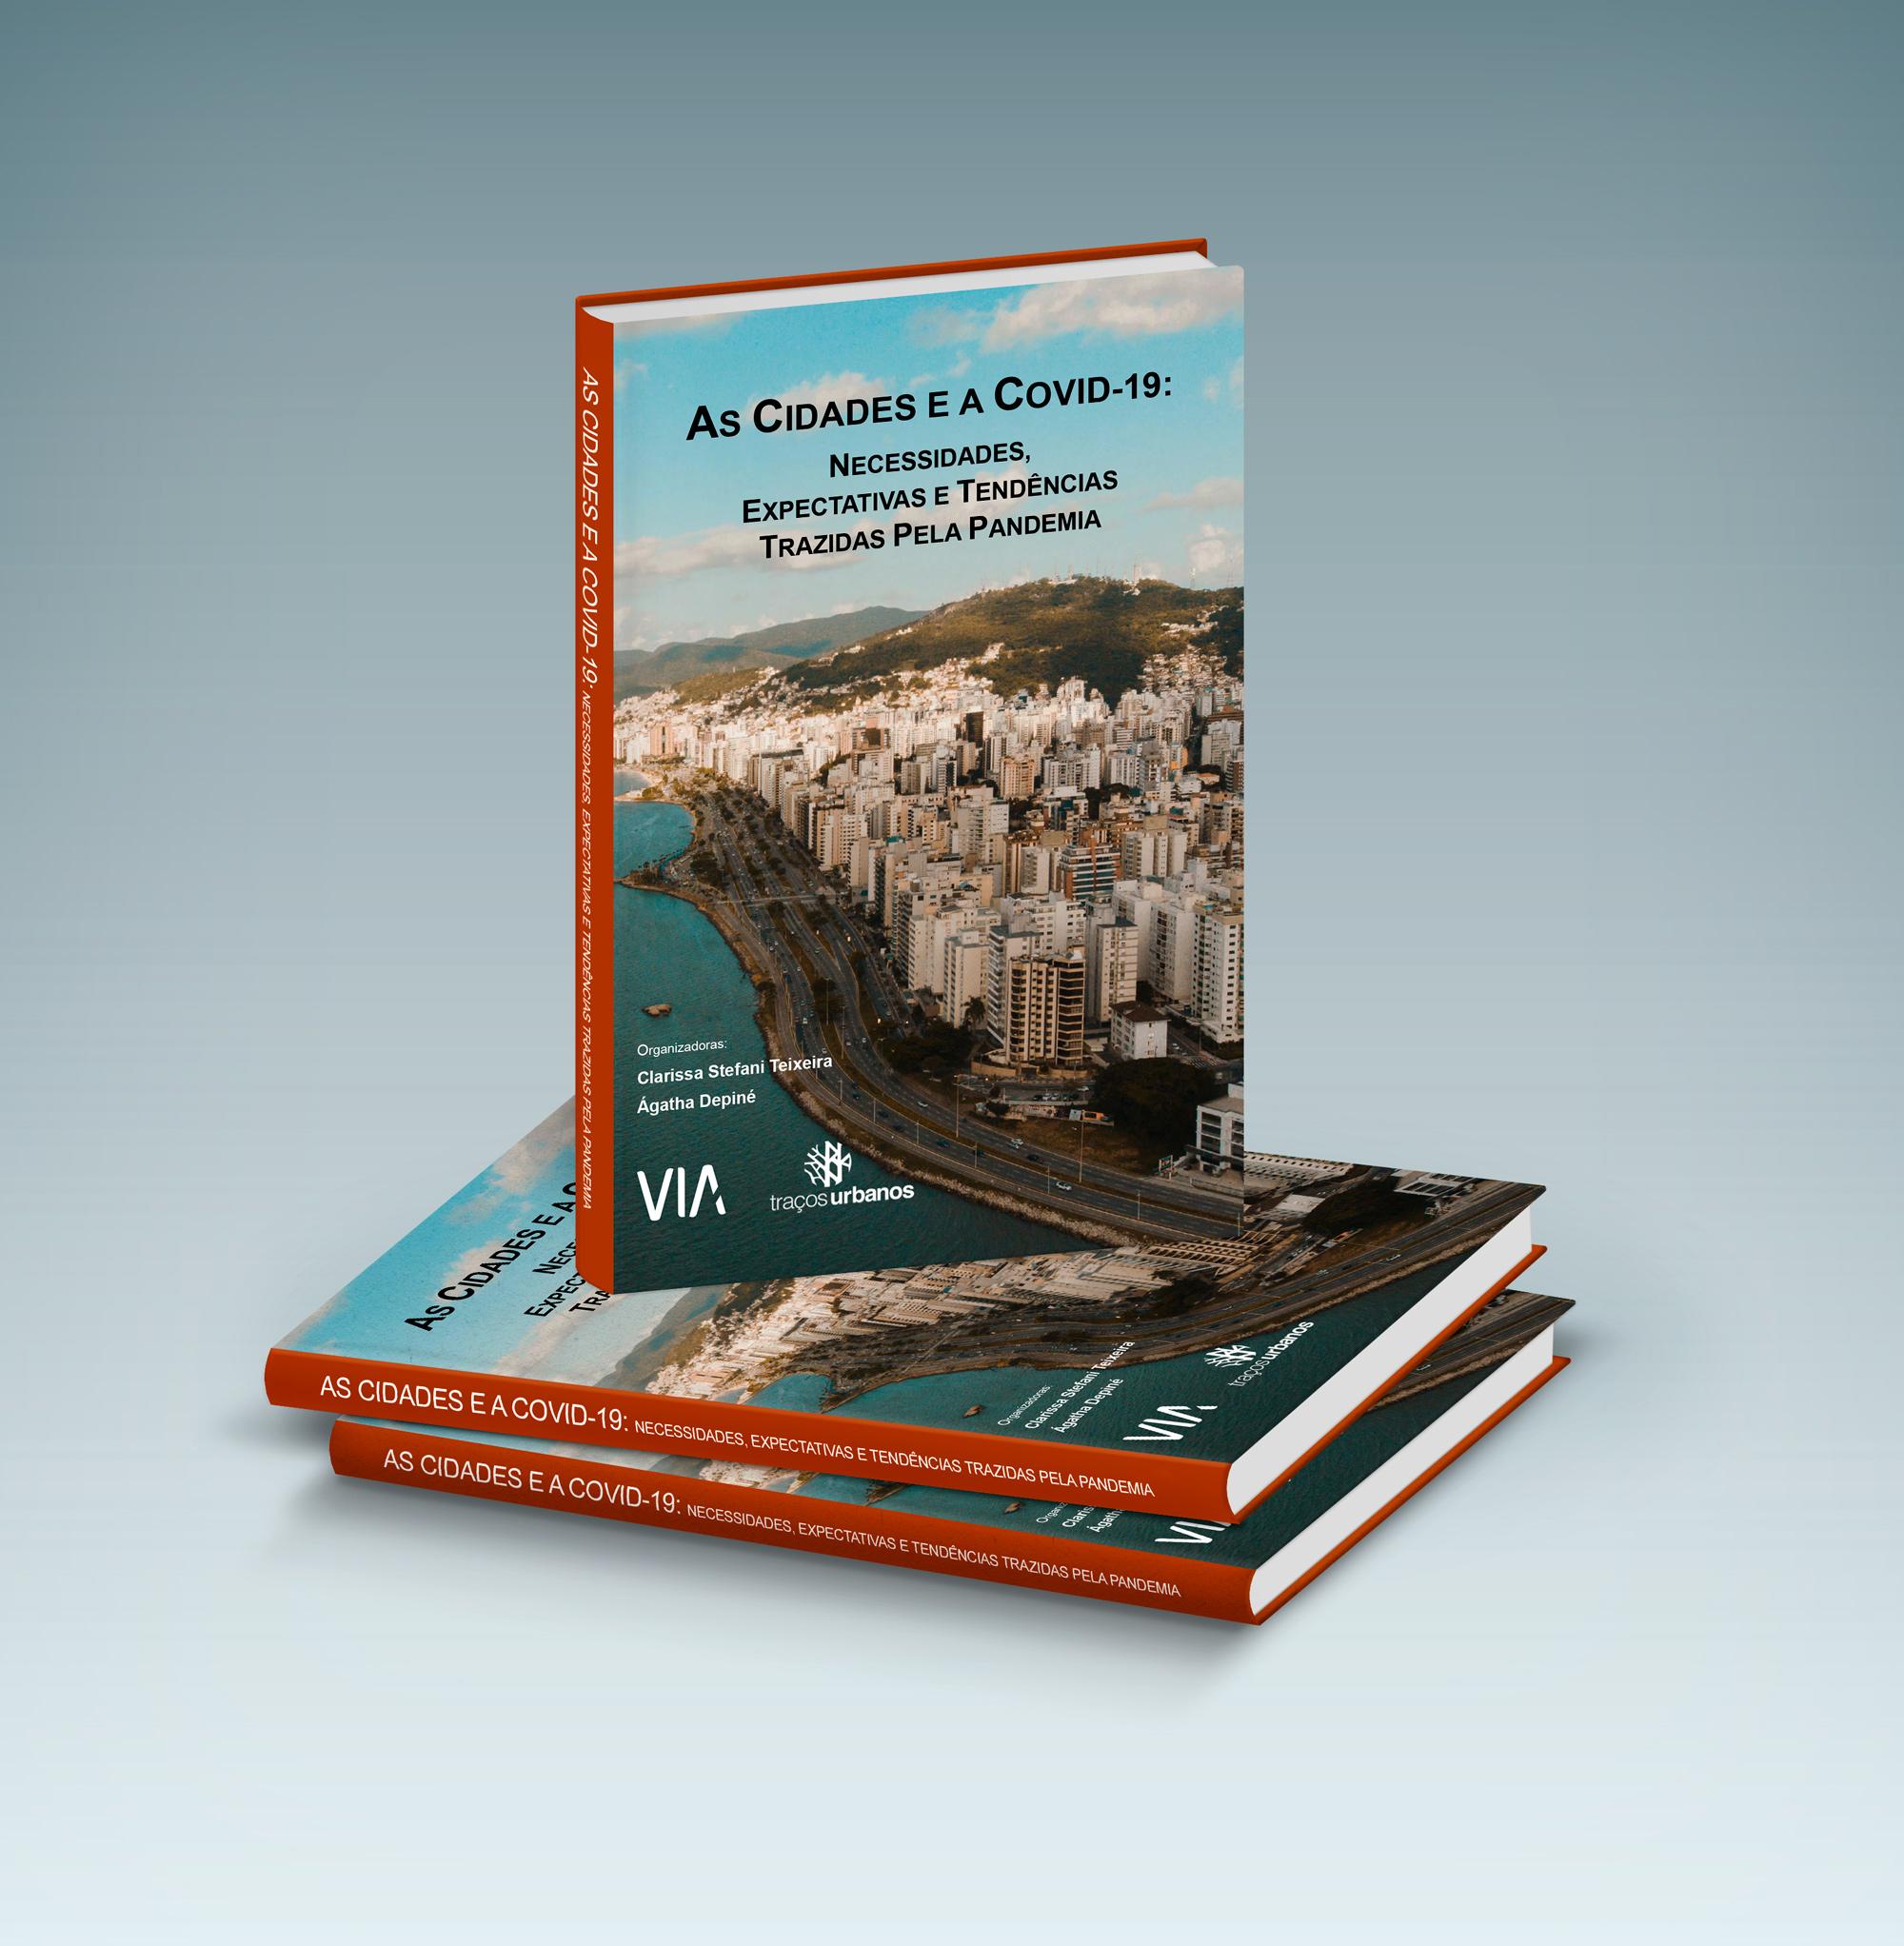 """Cidades E A Covid-19"": Lançamento Da Coletânea De Ensaios Sobre Cidades E A Pandemia"